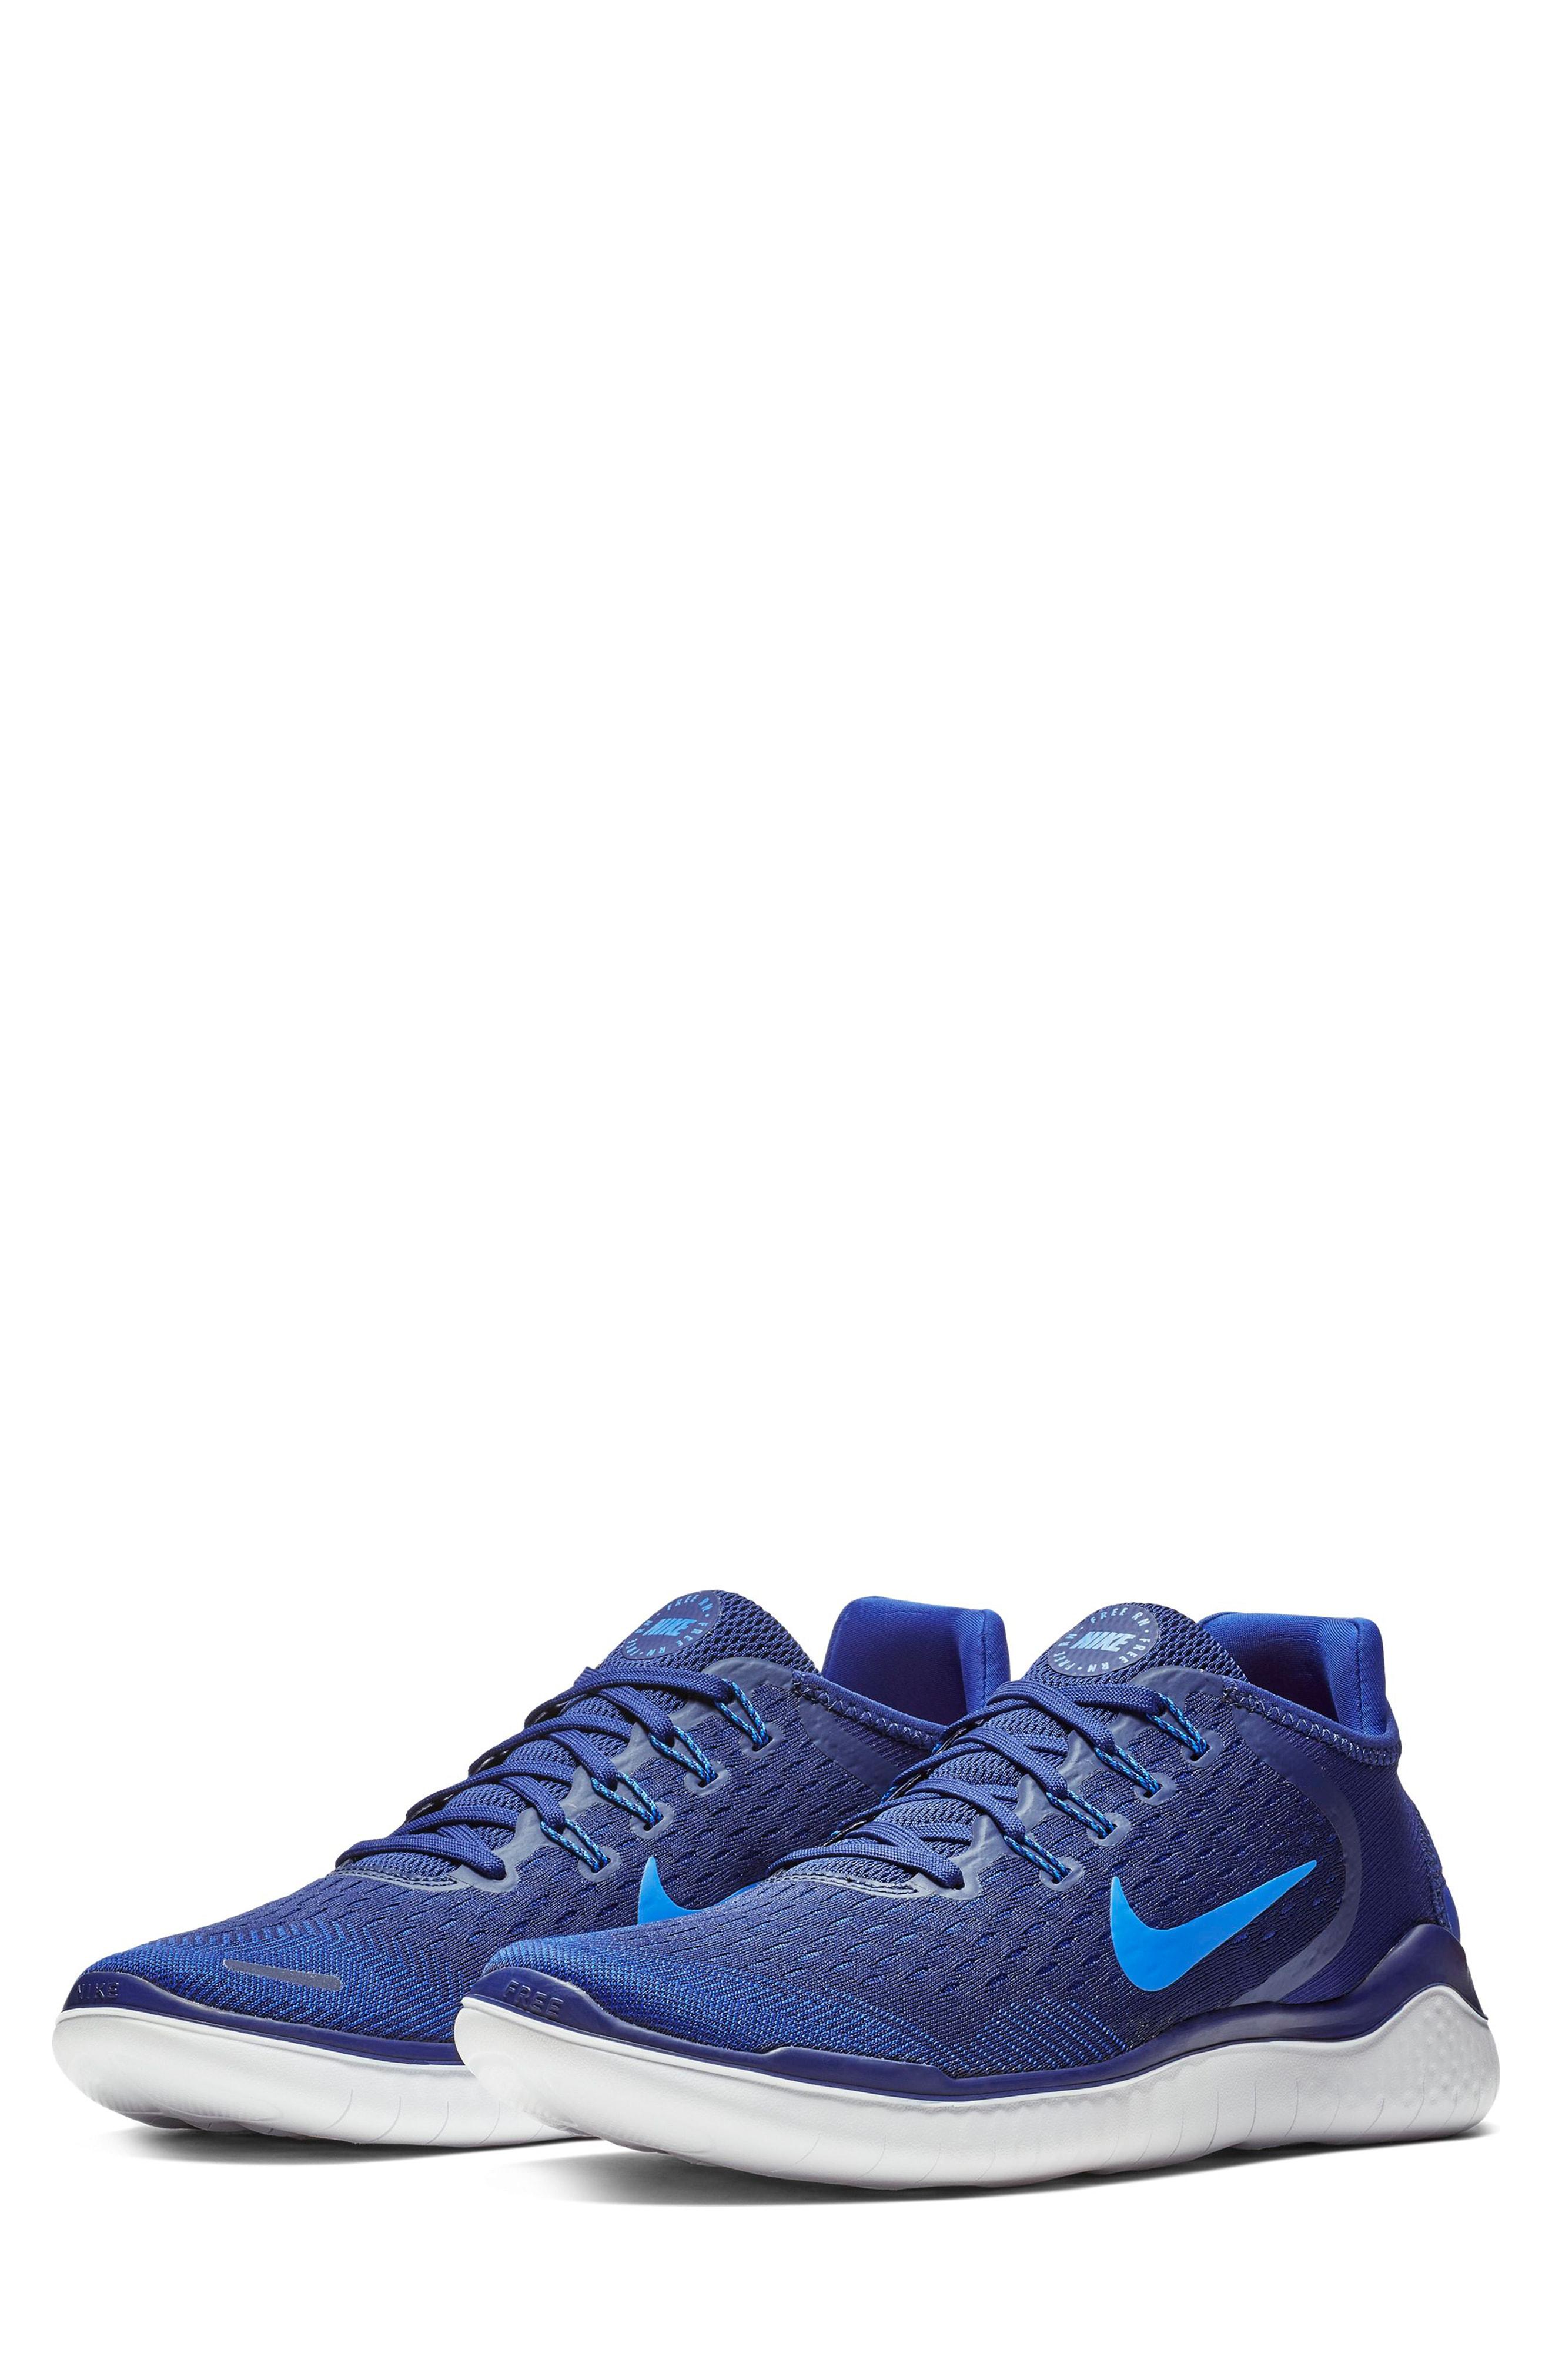 online store 533f9 11864 Nike Free Rn 2018 Running Shoe In Blue Void  Photo Blue  Indigo